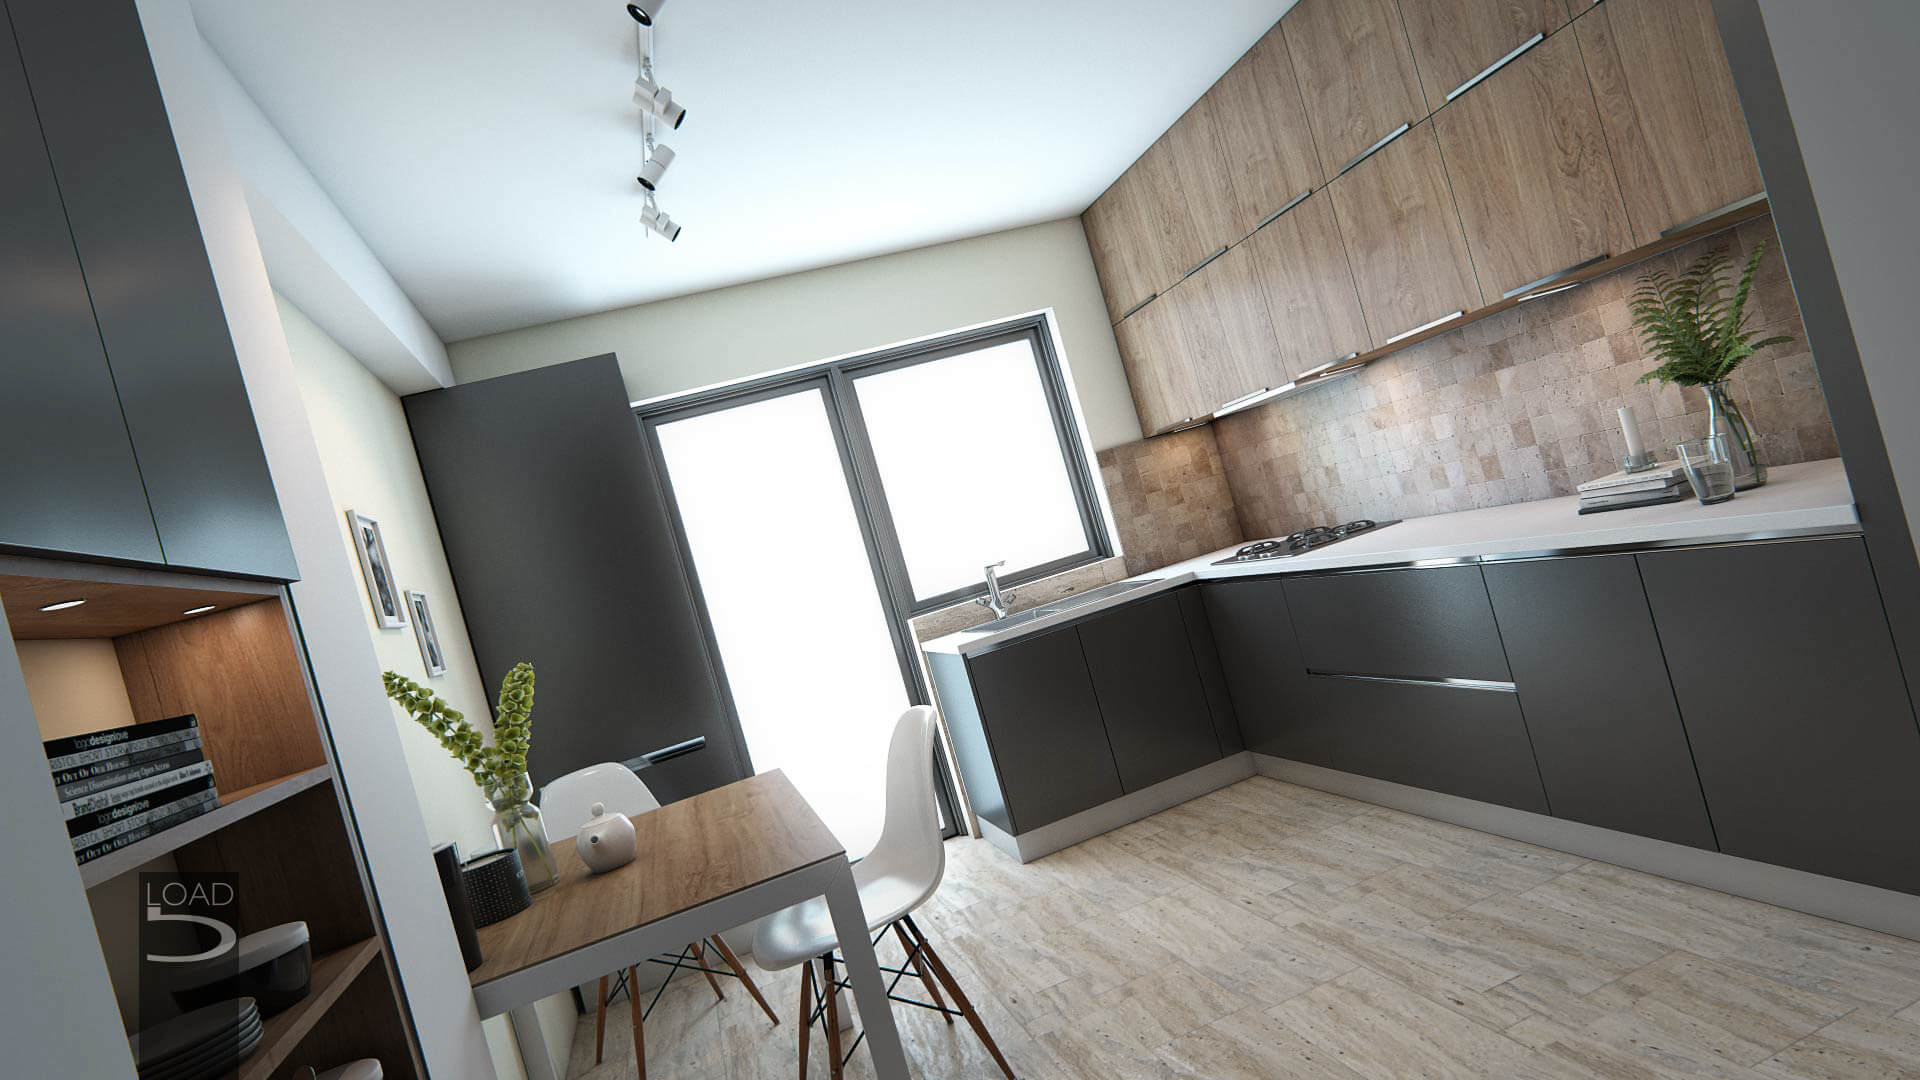 cgi visualization architectural en free interior landscape building design images architecture rendering photo villa